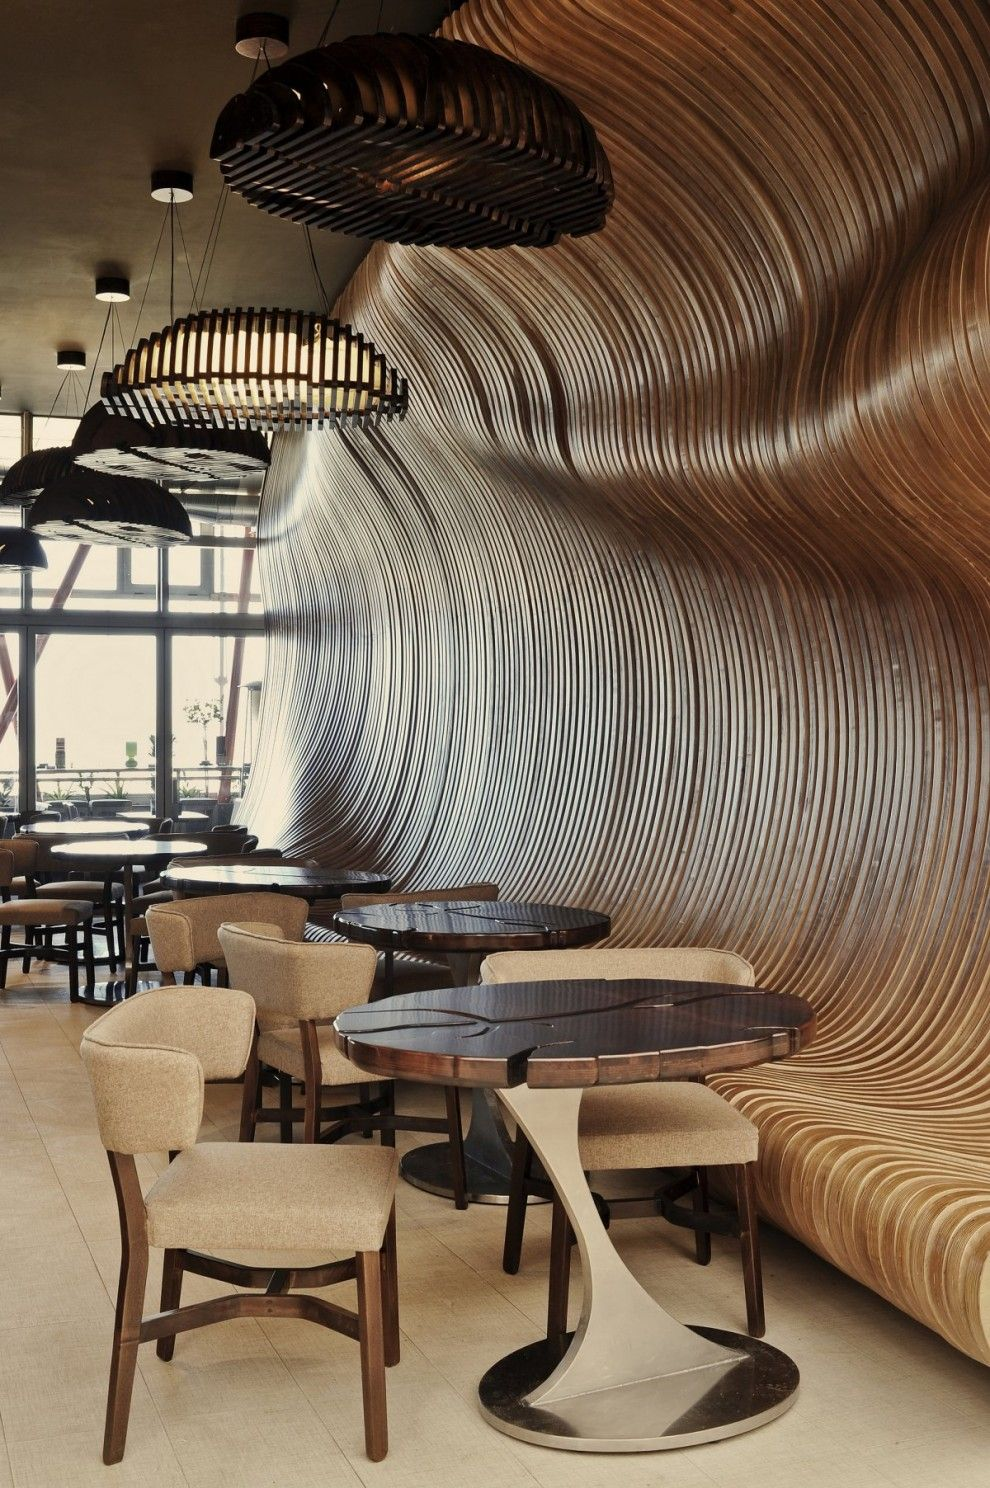 Don caf house innarch le design agence et caf for Design d interieur by srt